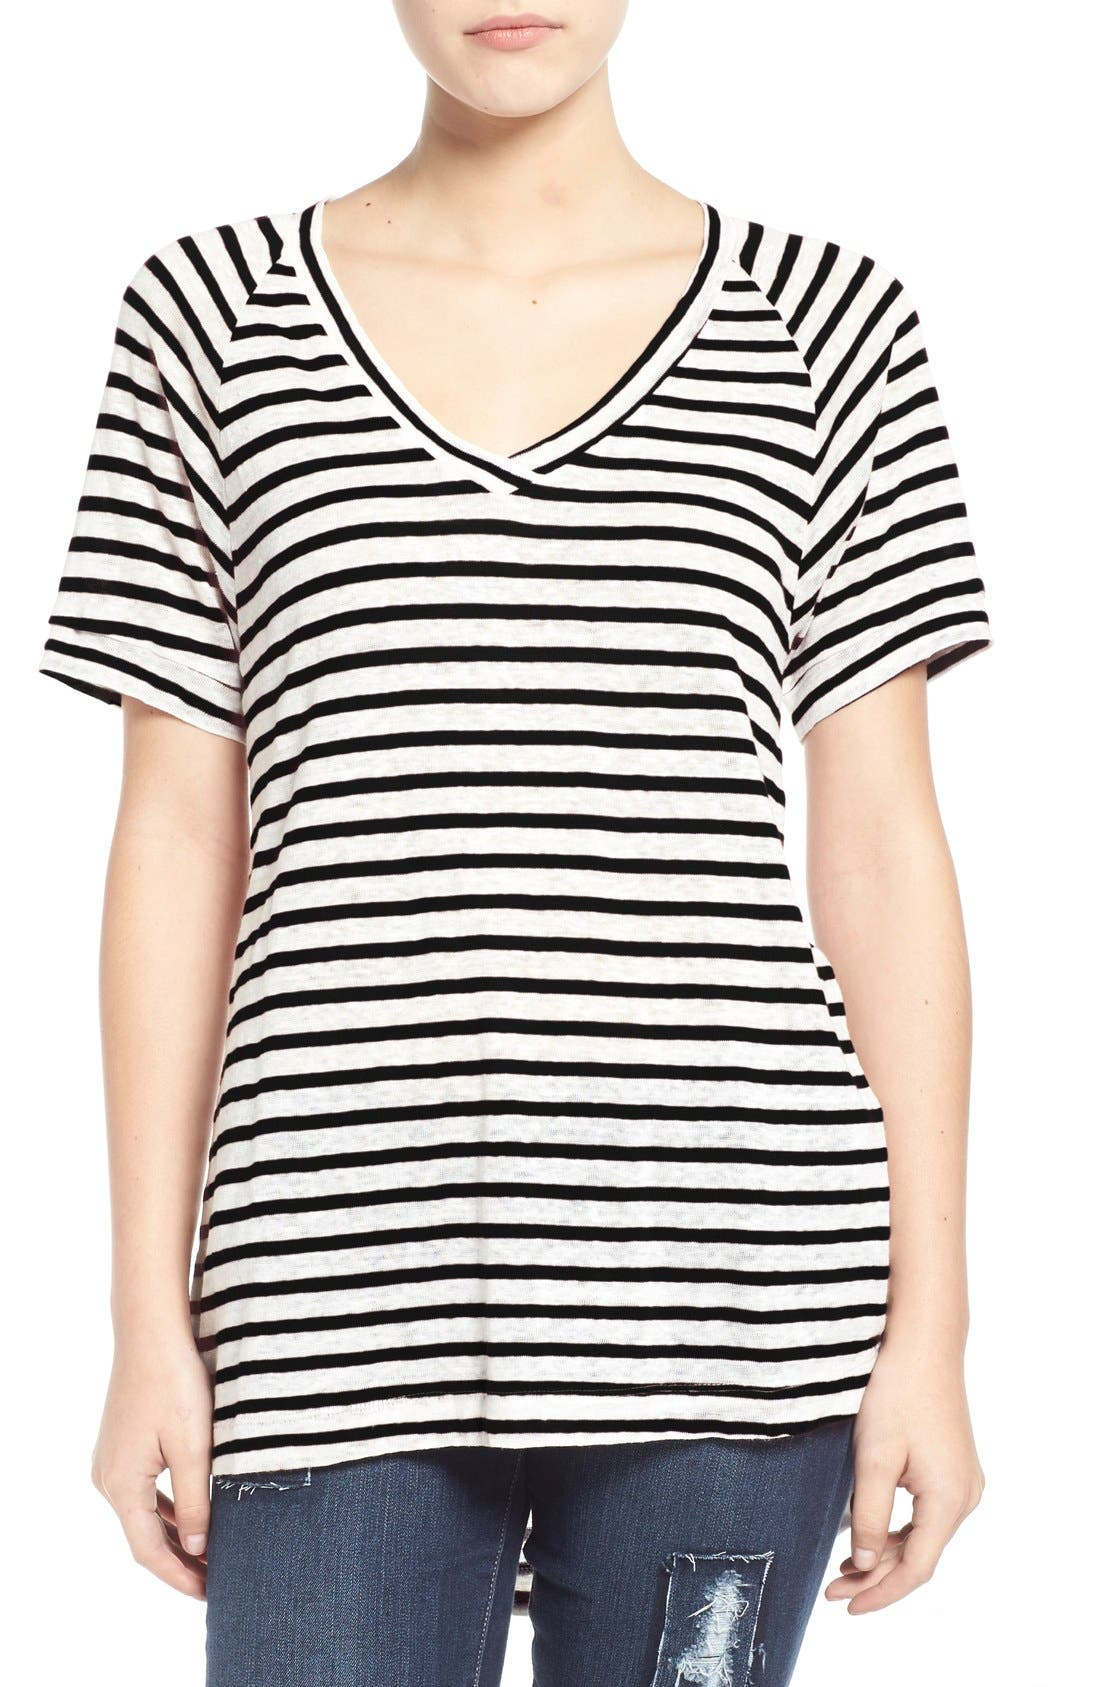 Alternate Image 1 Selected - The Hanger Stripe V-Neck High/Low Tee